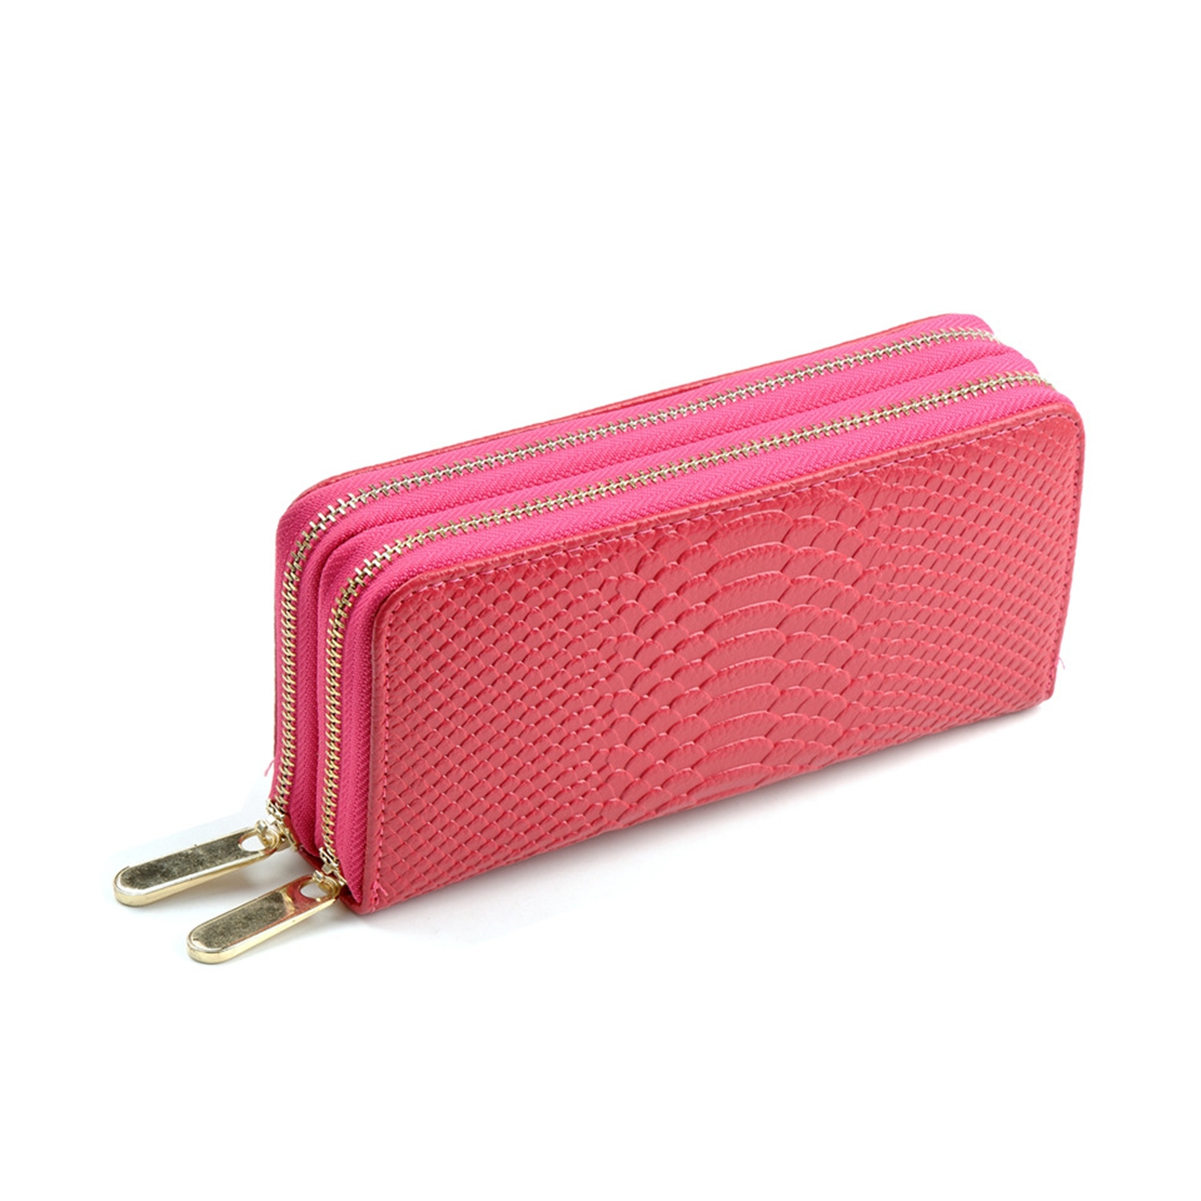 Women Tote Purse Leather Wallet Clutch Quilted Handbag Wristlet Card Holder Dual Zipper